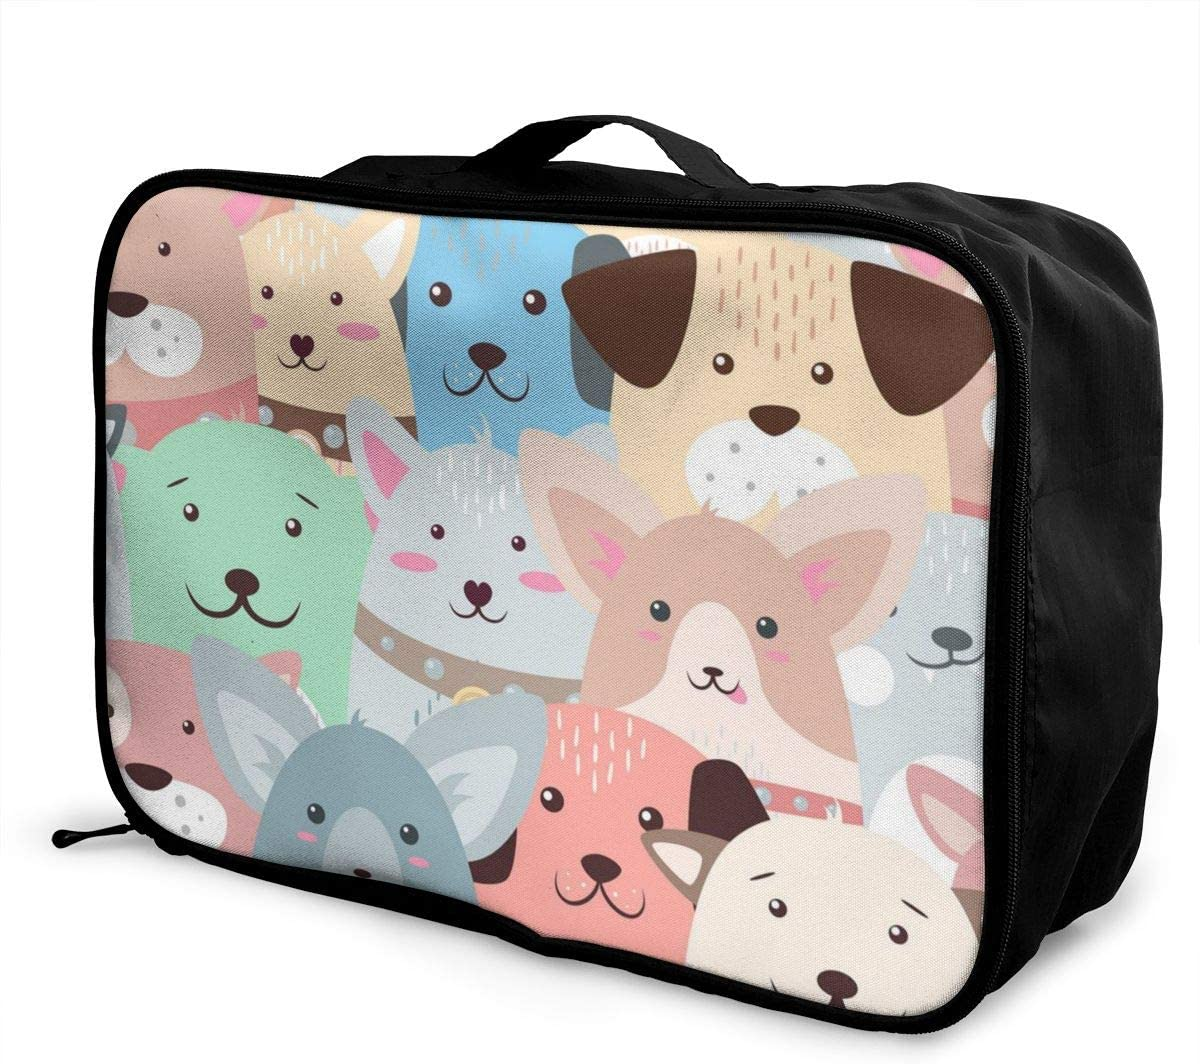 Yunshm Animals Dog Cute Funny Pattern Customized Trolley Handbag Waterproof Unisex Large Capacity For Business Travel Storage